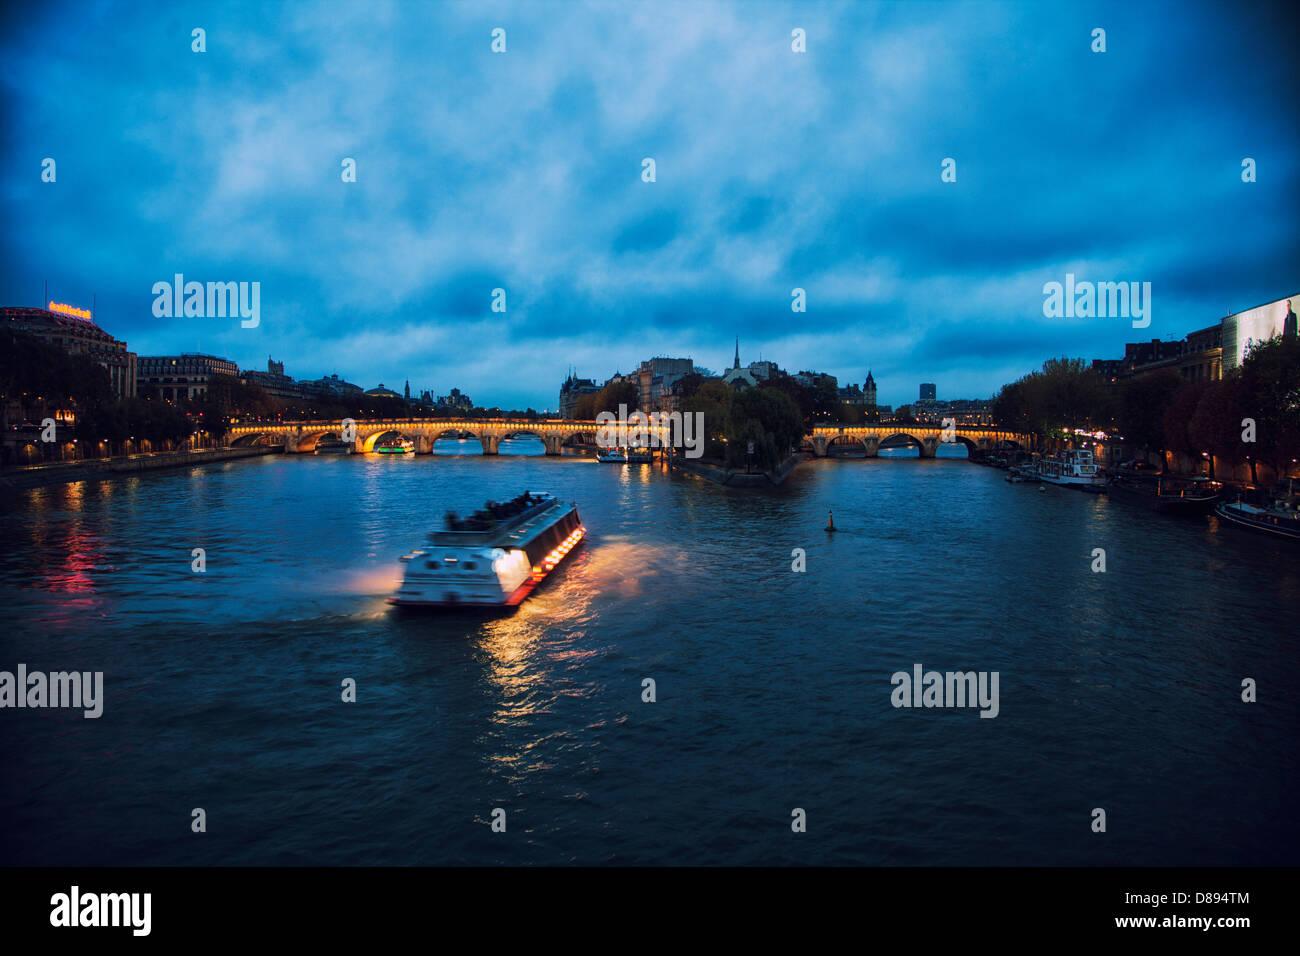 Romantic evening in Paris France. River Cruise, River Seine, Pont Neuf. - Stock Image